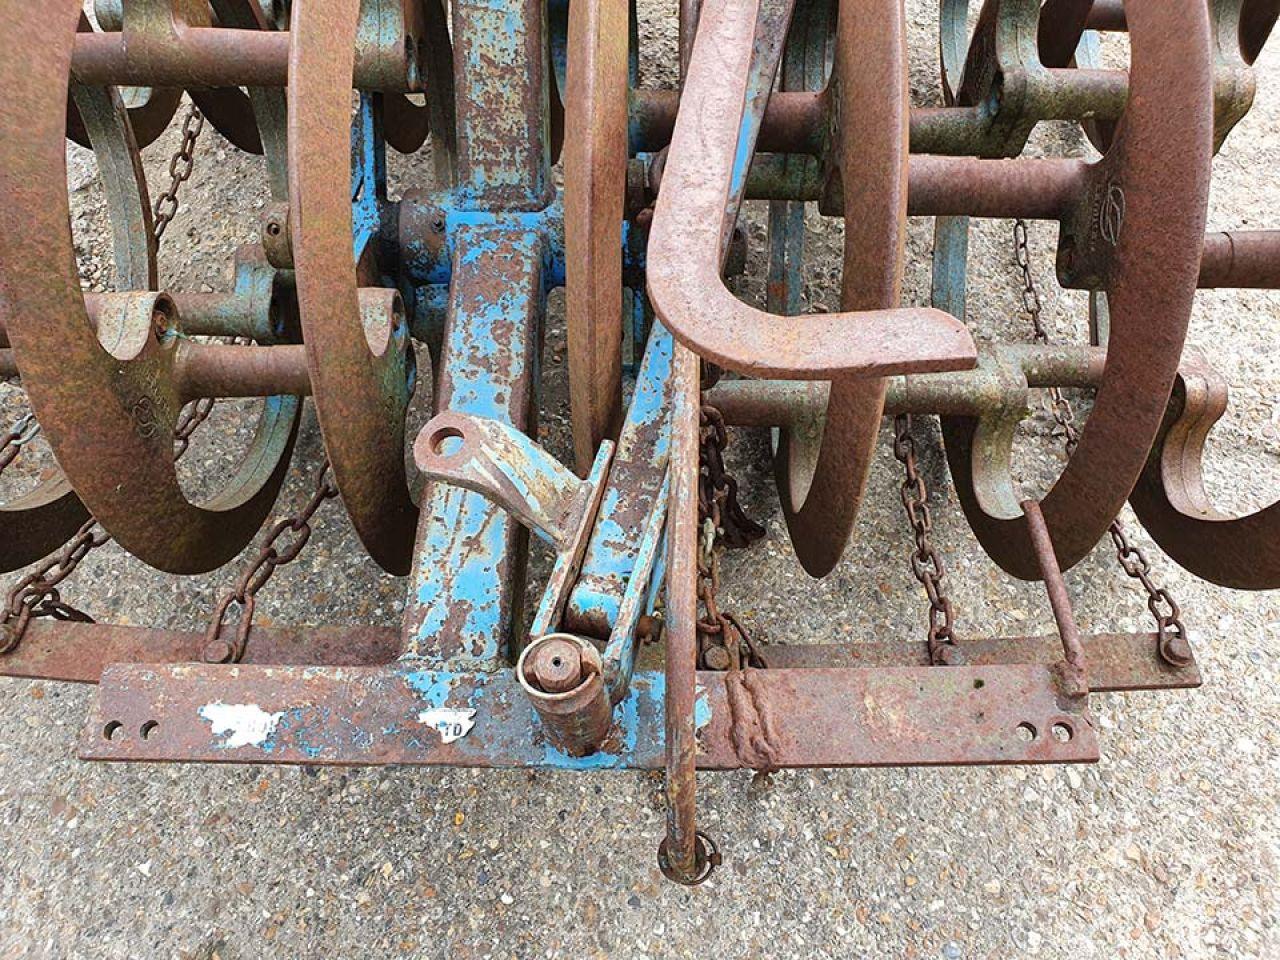 LEMKEN 080 16 RING TRAILED FURROW PRESS